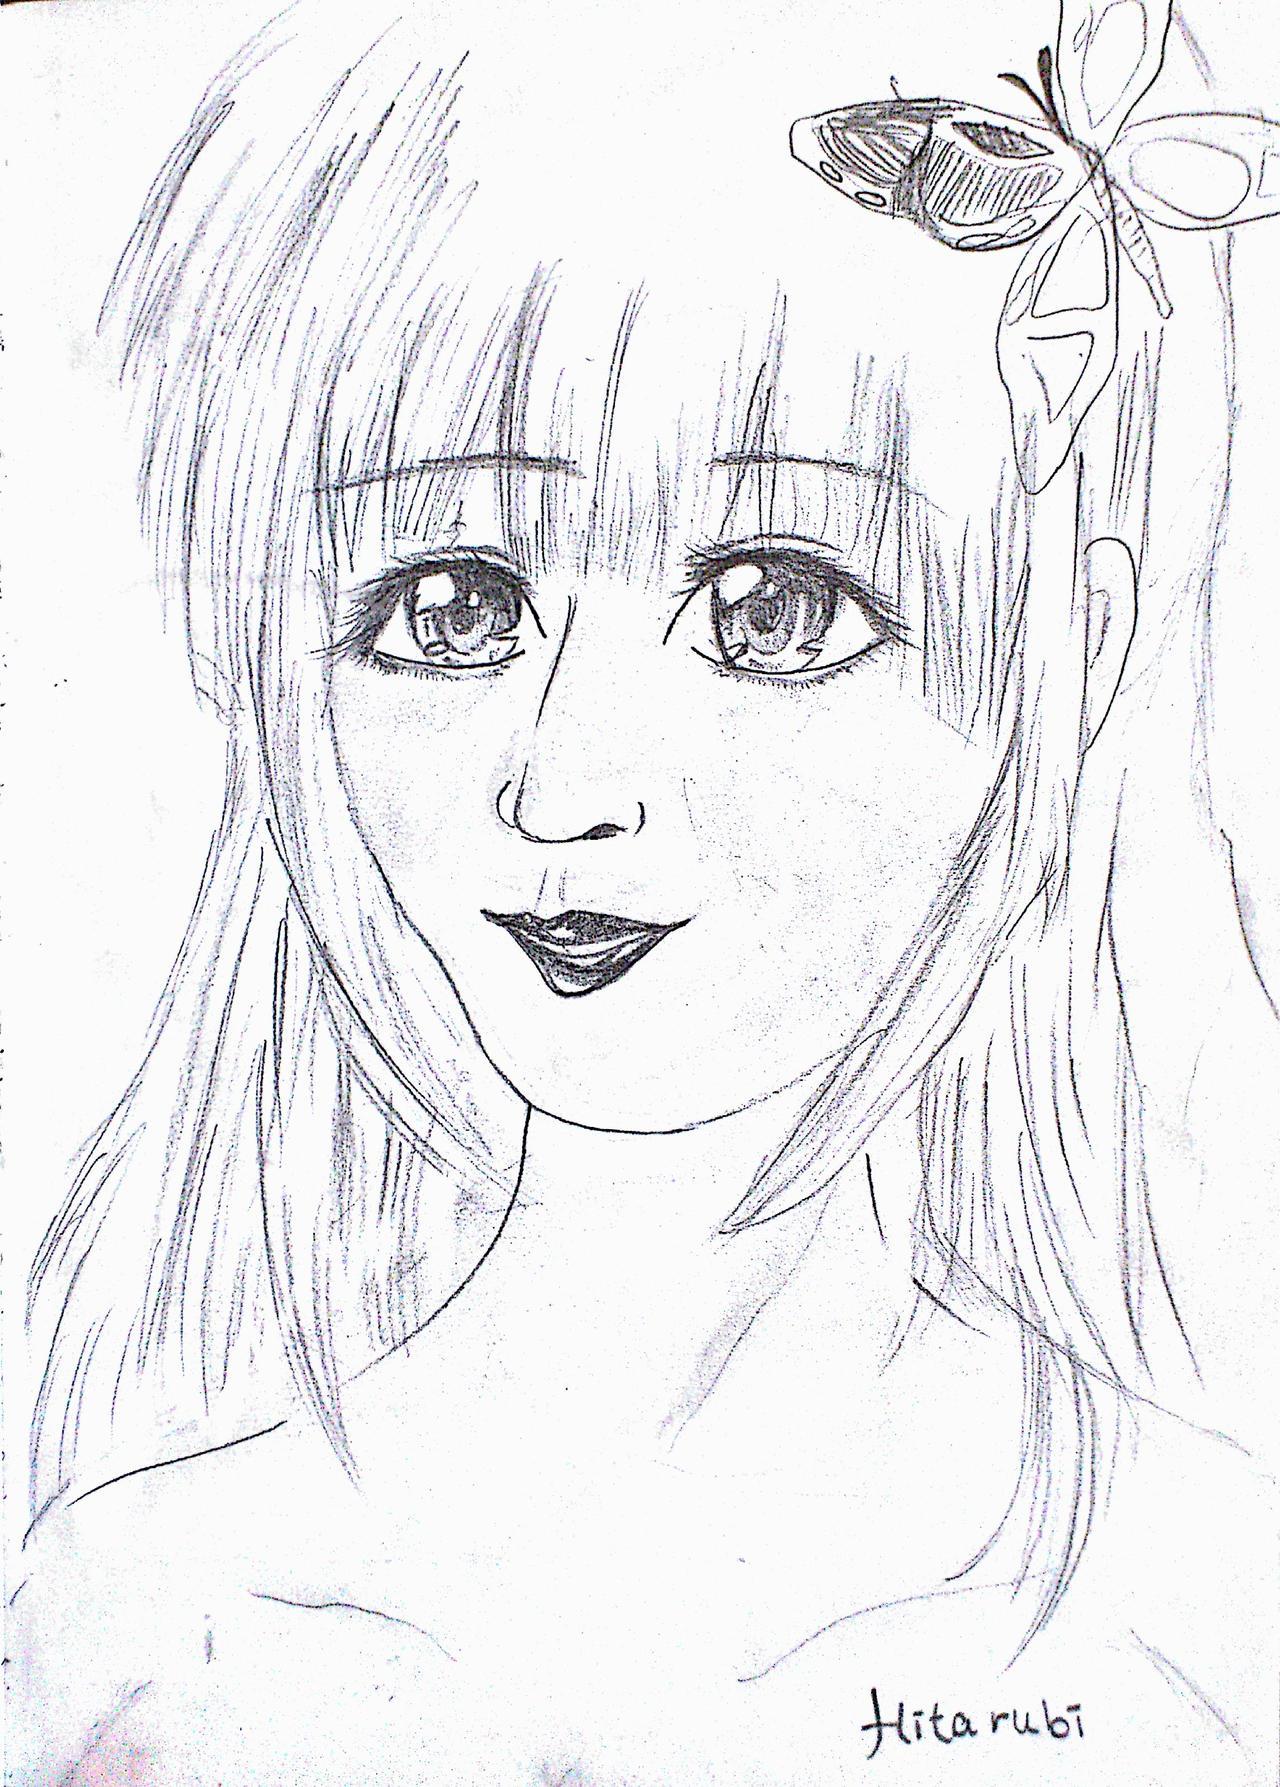 Anime Drawings - Anime Drawings By Irihime 3Chan Bgvd